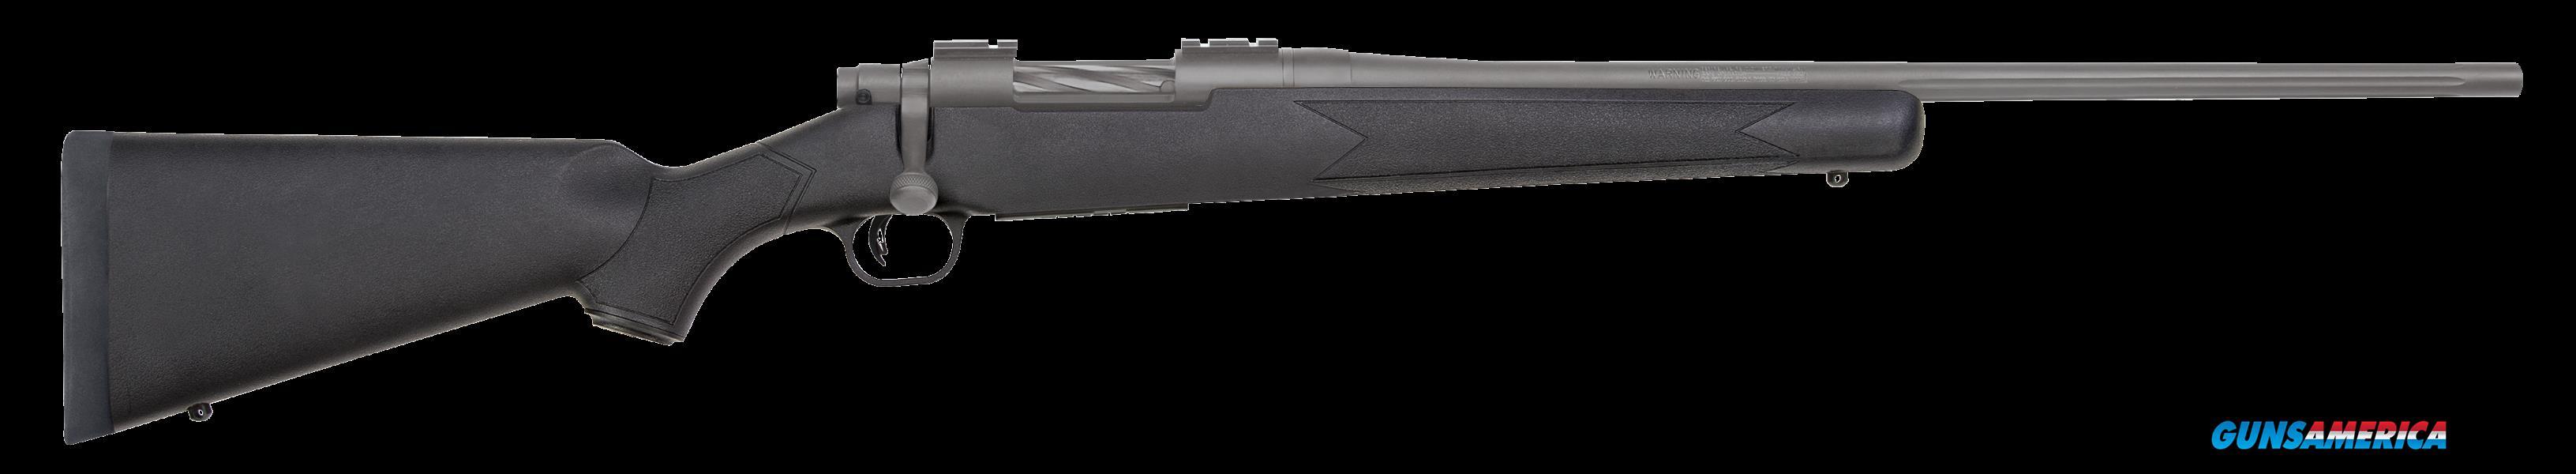 Mossberg Patriot, Moss 28008 Patriot 22 Fb 6.5   5+1 Syn Cerakote Ss  Guns > Pistols > 1911 Pistol Copies (non-Colt)